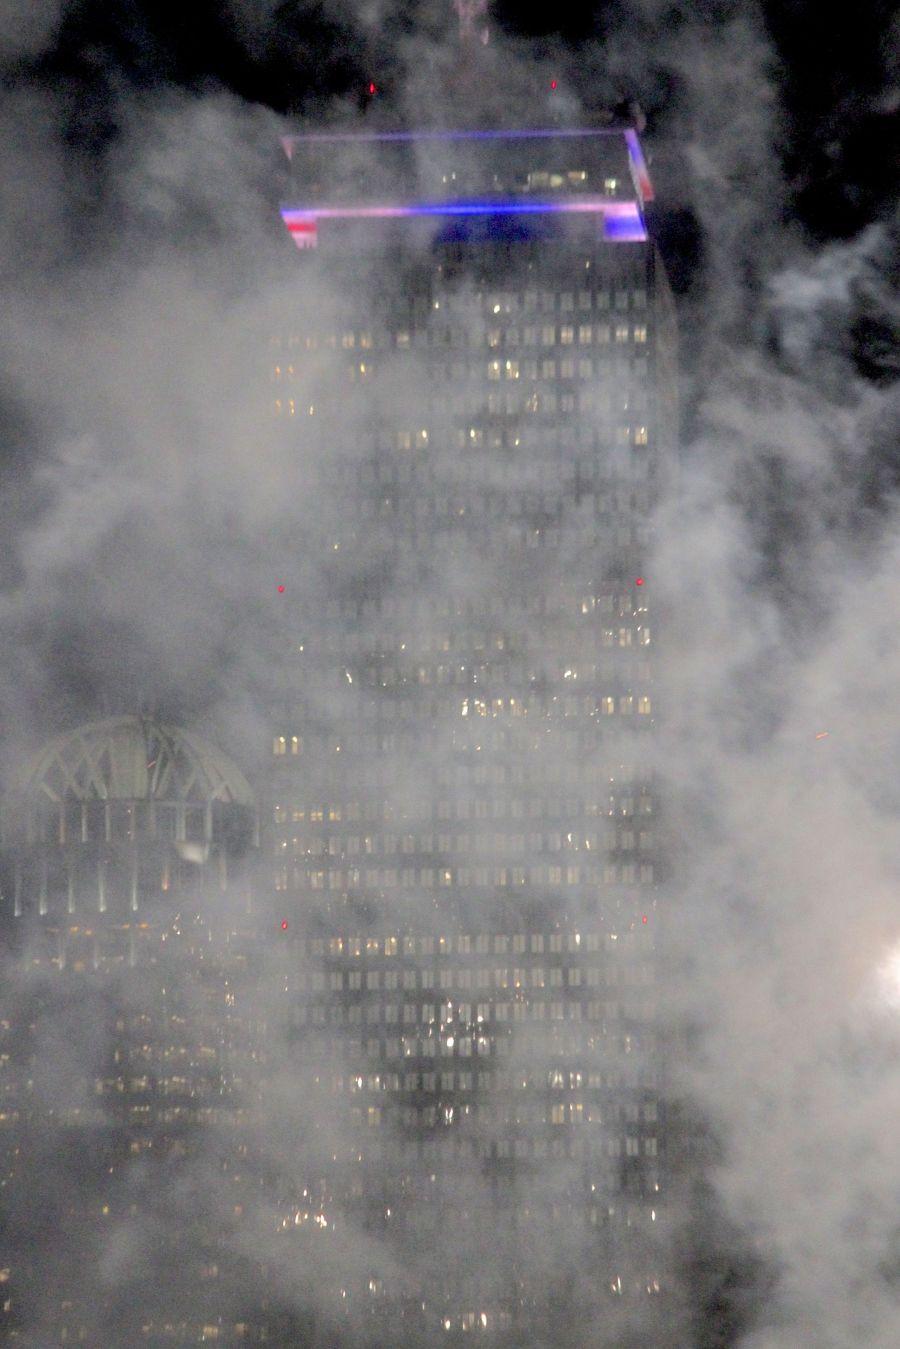 boston july 3 2014 fireworks charles river 28